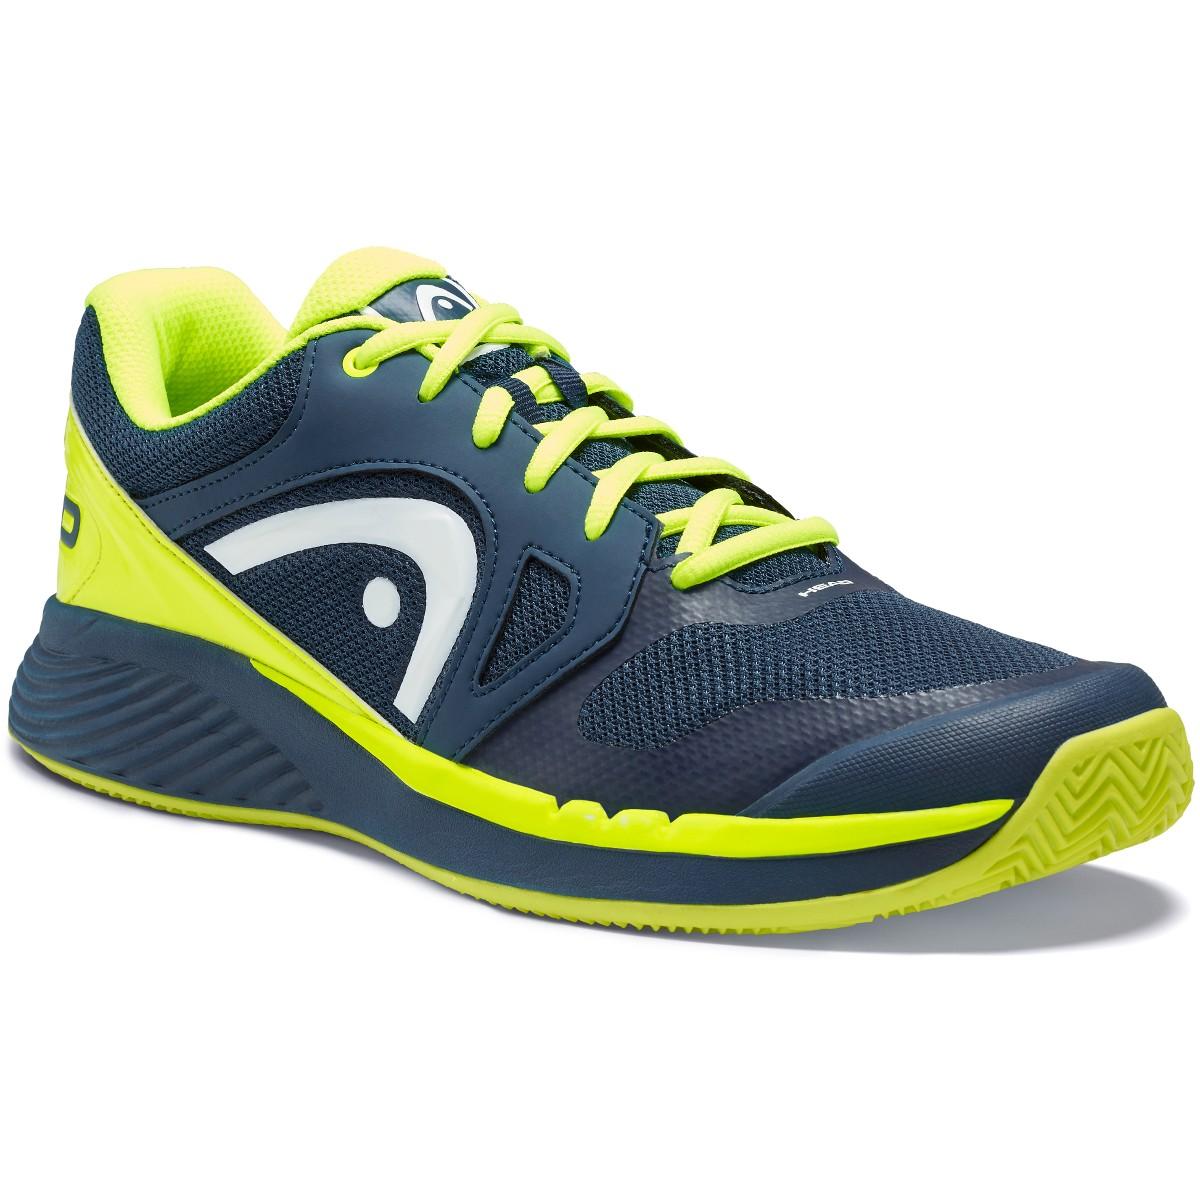 Evo Head Battue Sprint Homme Chaussures Terre vNymOn0w8